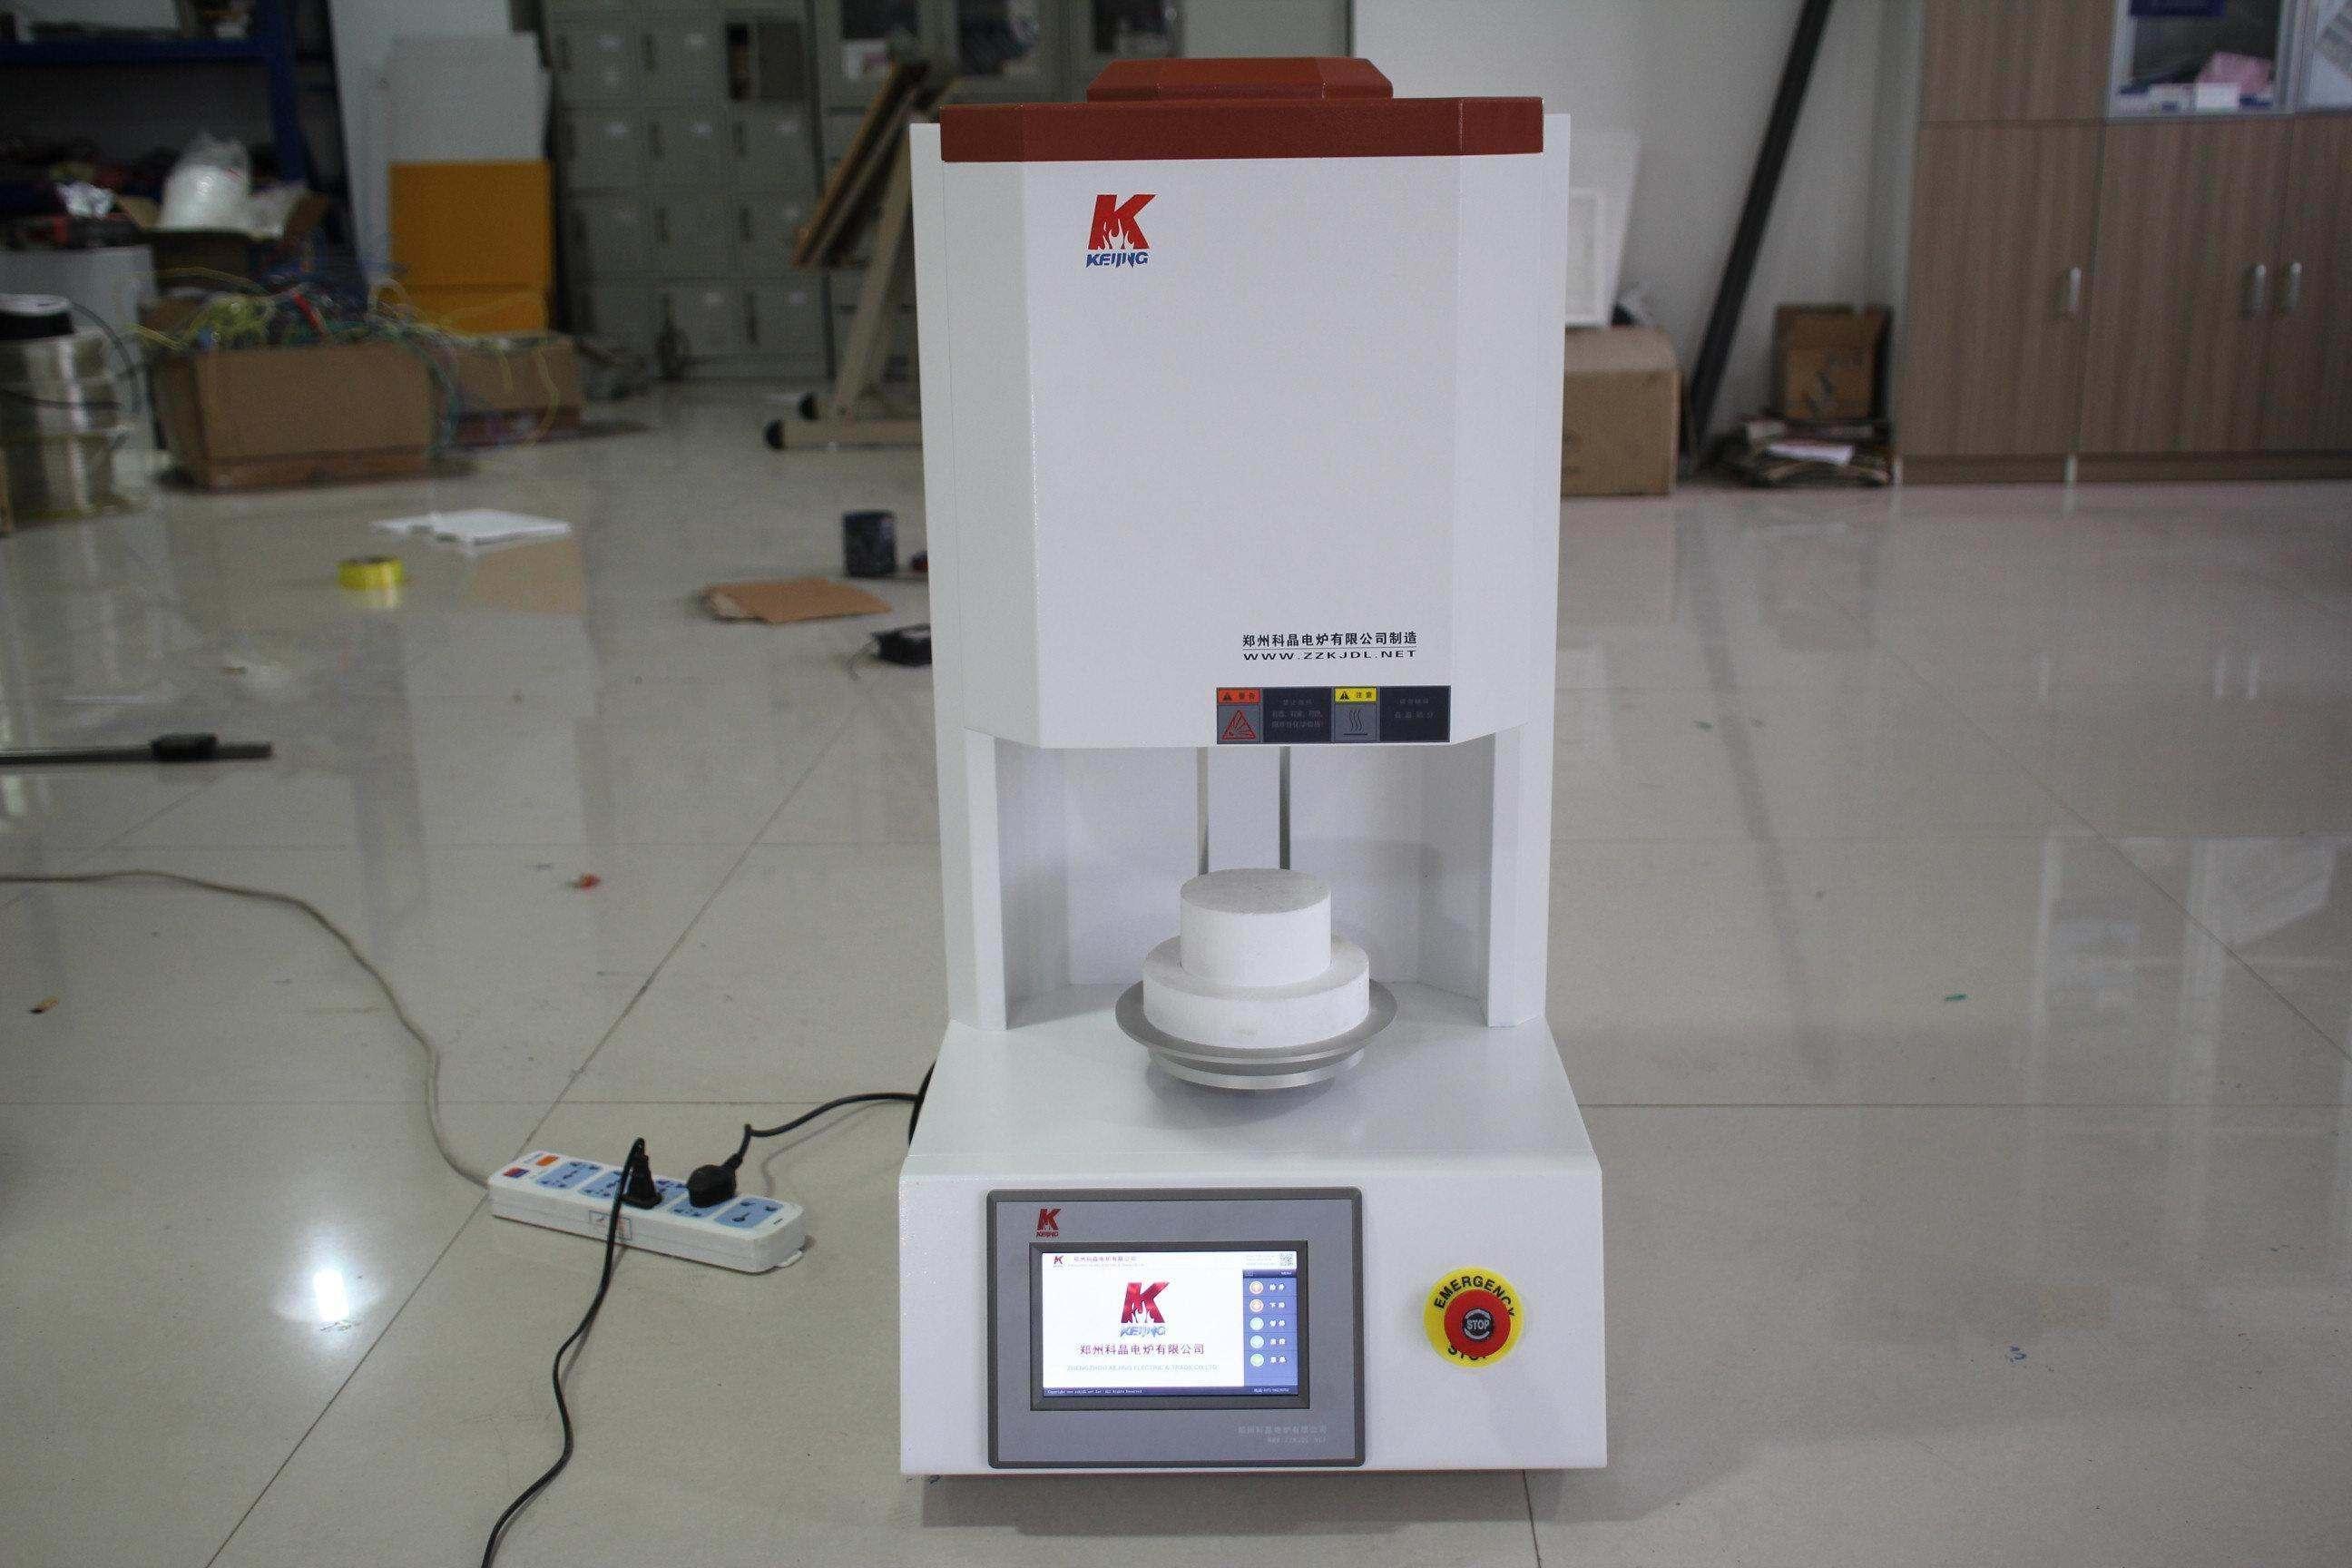 Jz-D1650 Sintering Dental Furnace with Phone APP Control